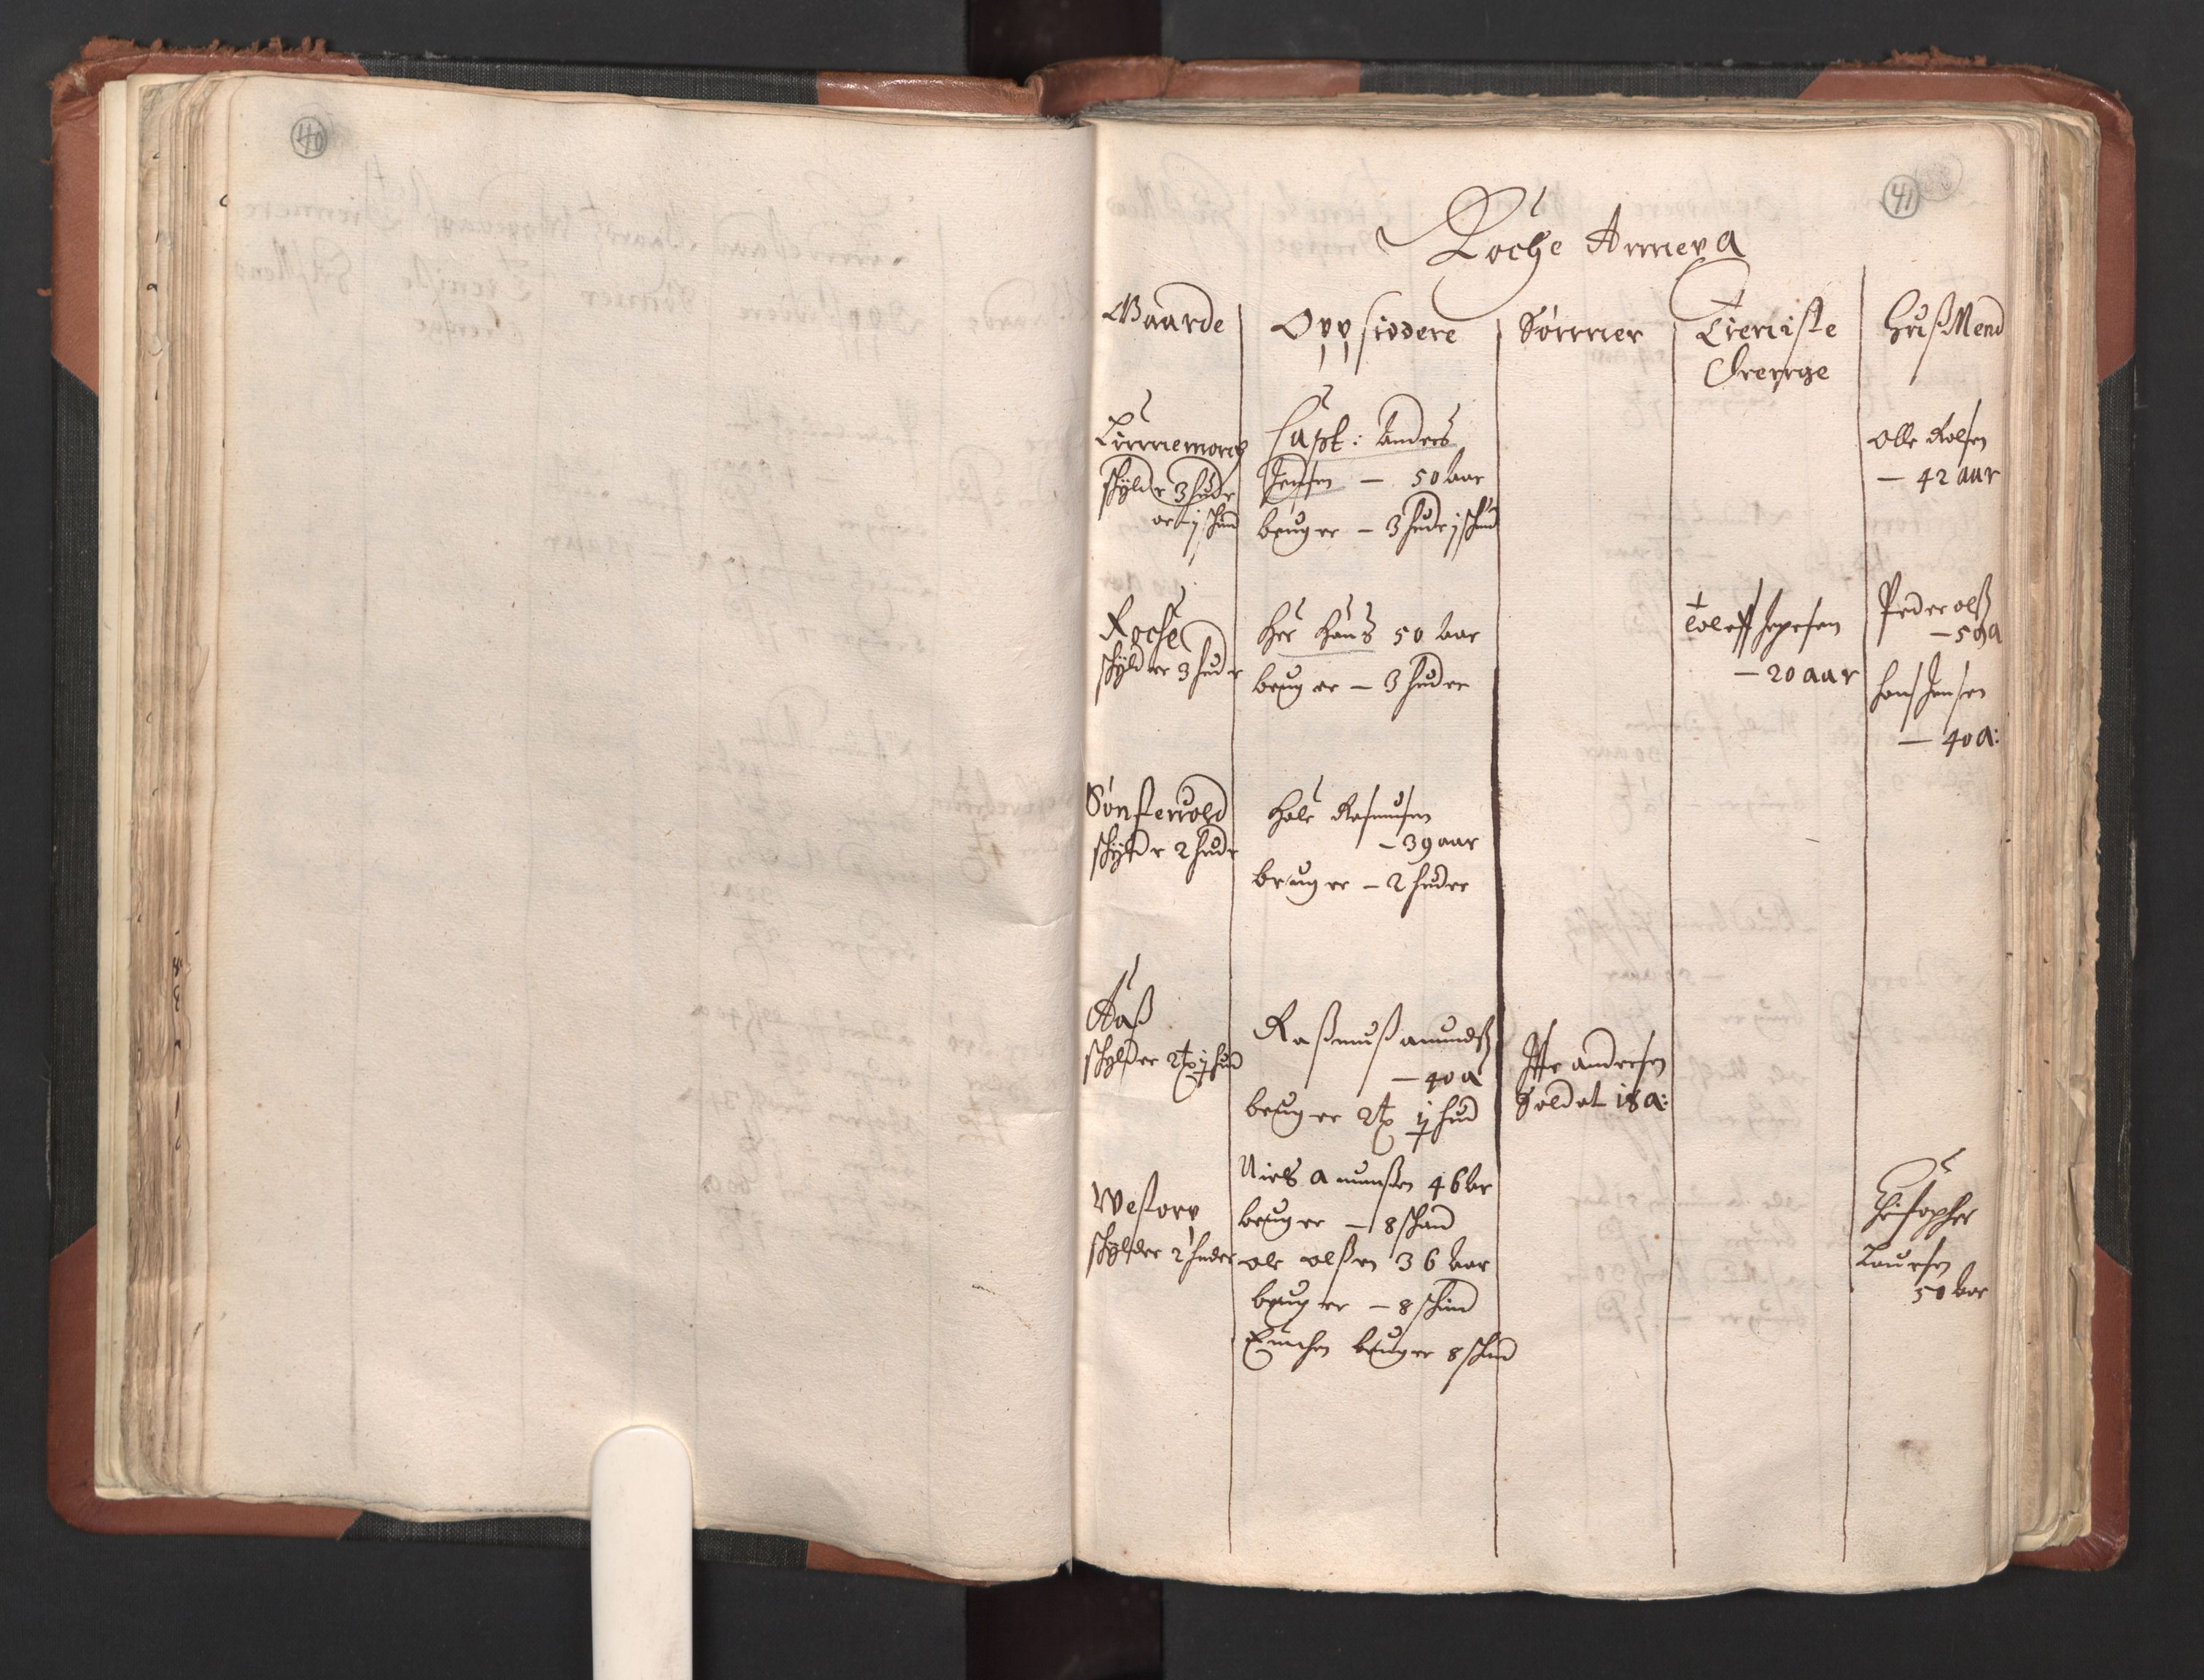 RA, Fogdenes og sorenskrivernes manntall 1664-1666, nr. 1: Fogderier (len og skipreider) i nåværende Østfold fylke, 1664, s. 40-41